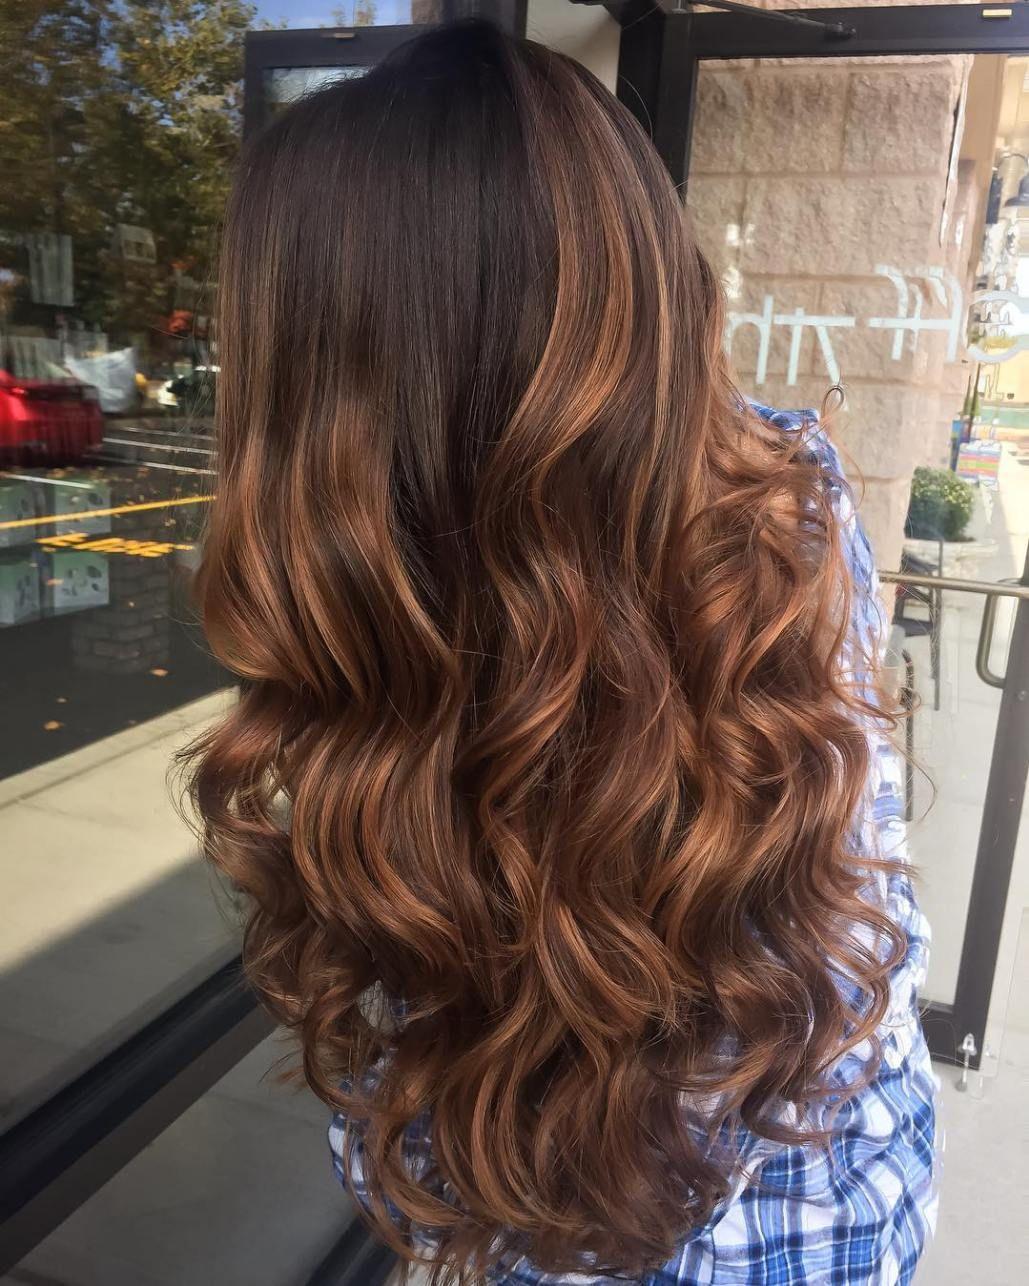 20 Tiger Eye Hair Ideas To Hold Onto Pinterest Auburn Highlights